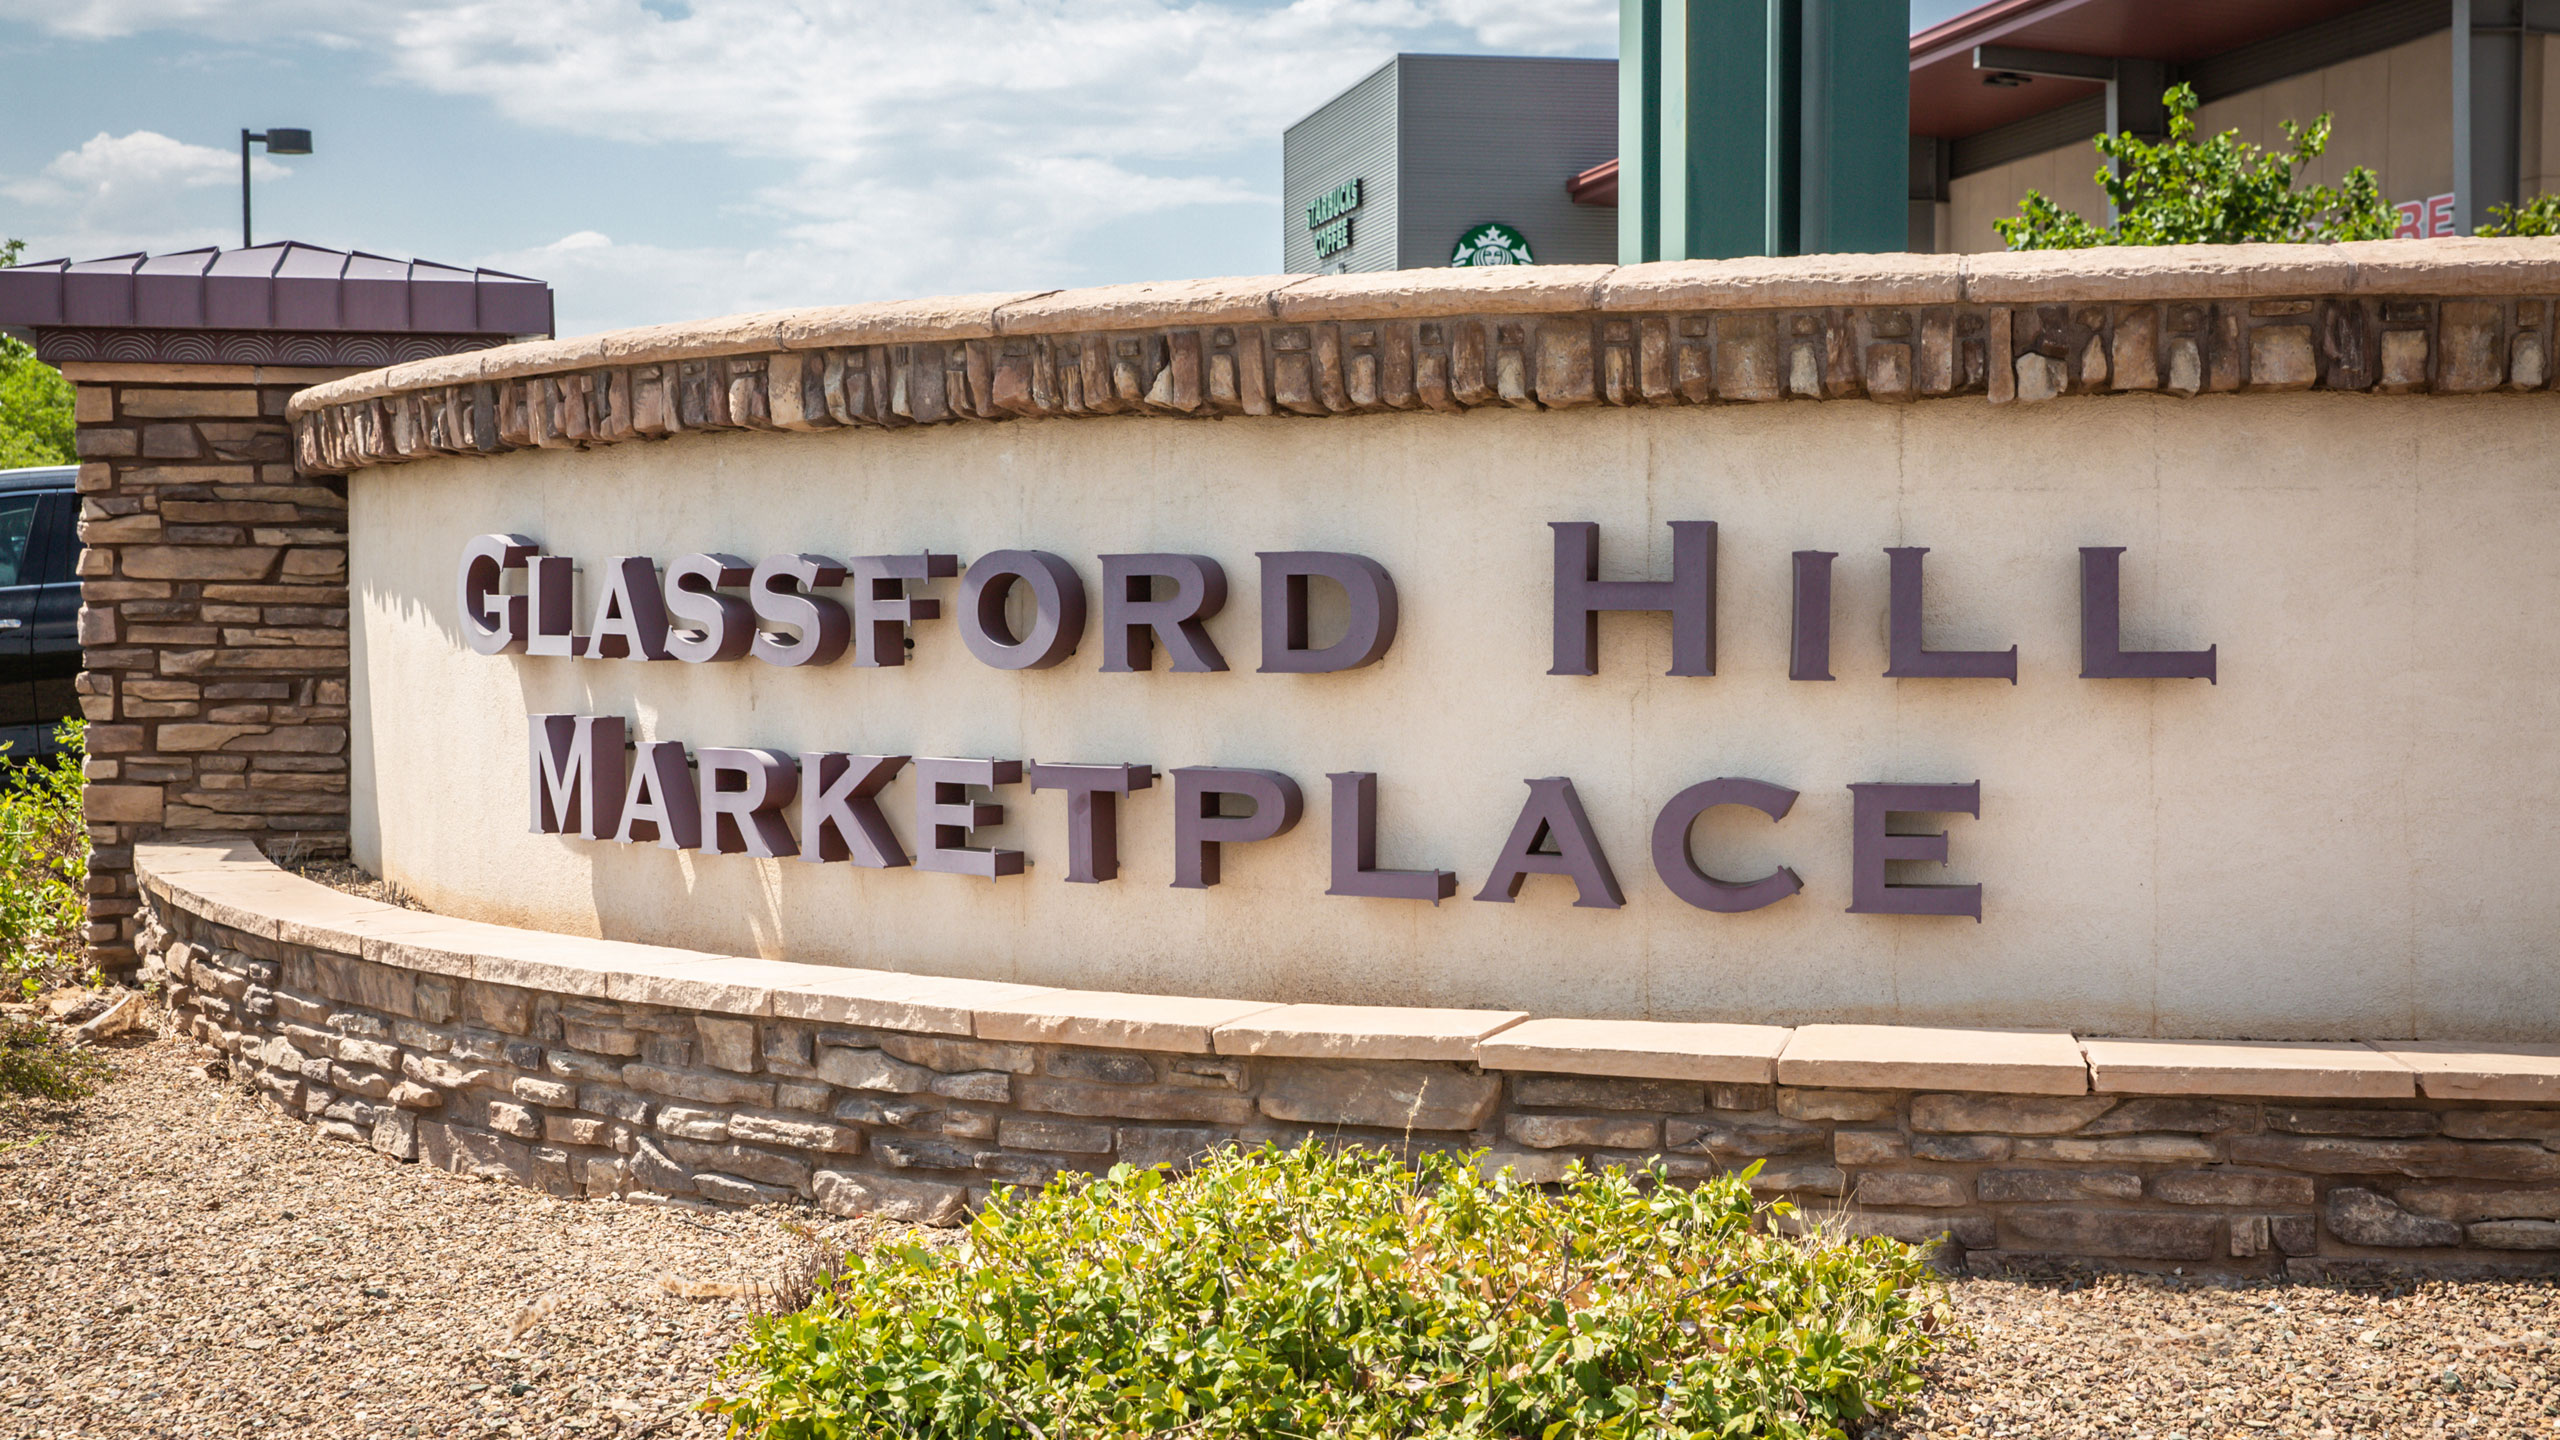 Glassford Hill Marketplace